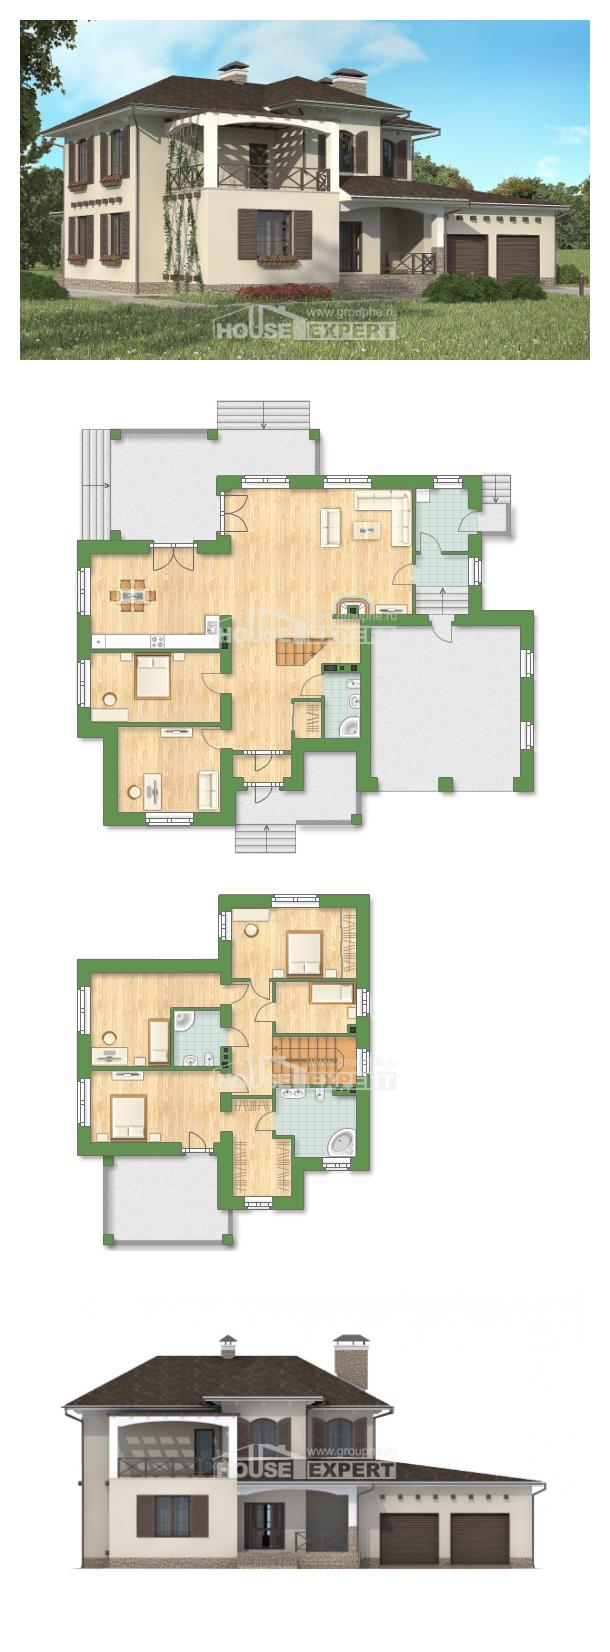 Projekt domu 285-002-R | House Expert